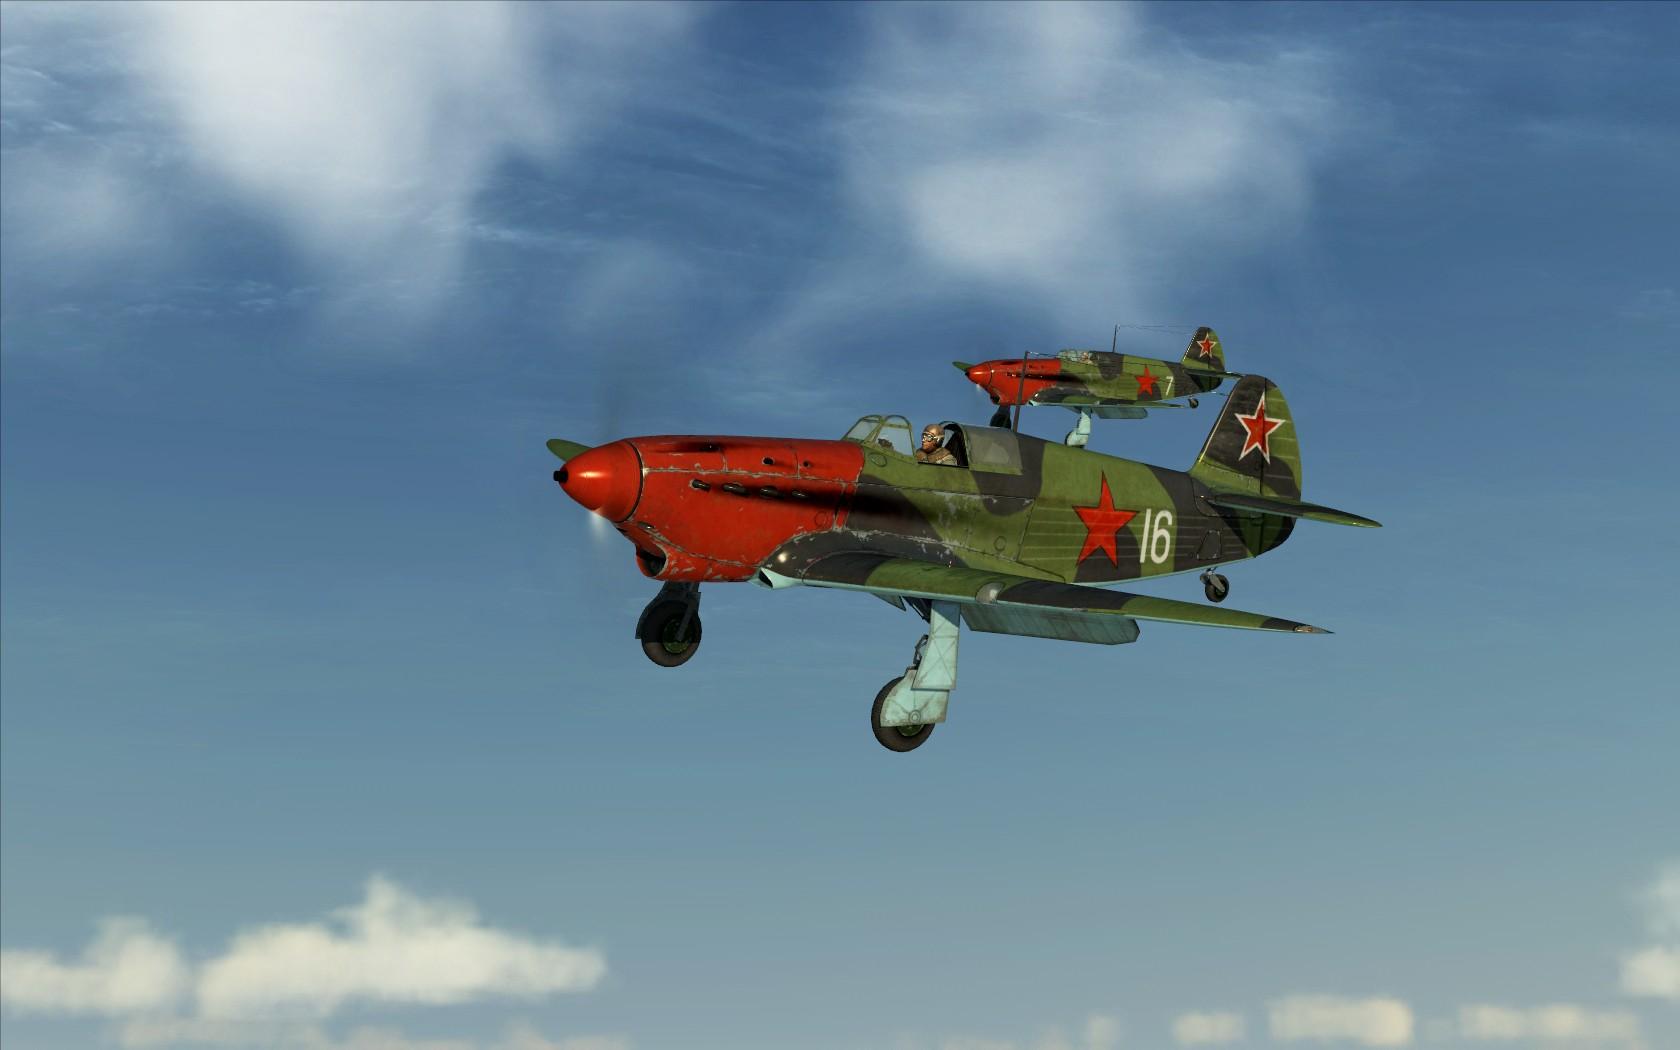 Mission M3 310